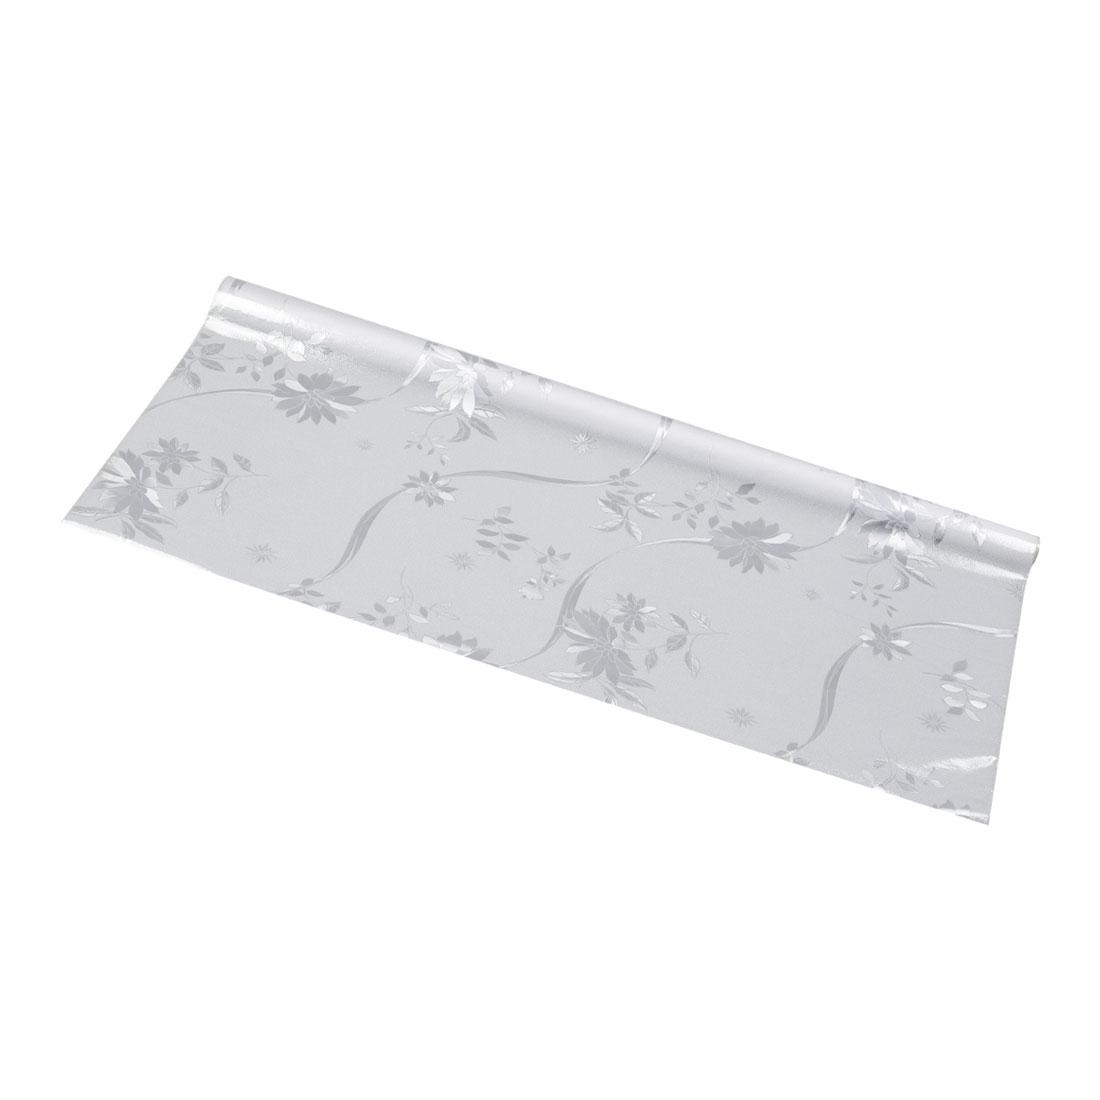 "Bathroom Home 35.4"" x 78.7"" Anti UV Window Film Sticker White Flower Shape"